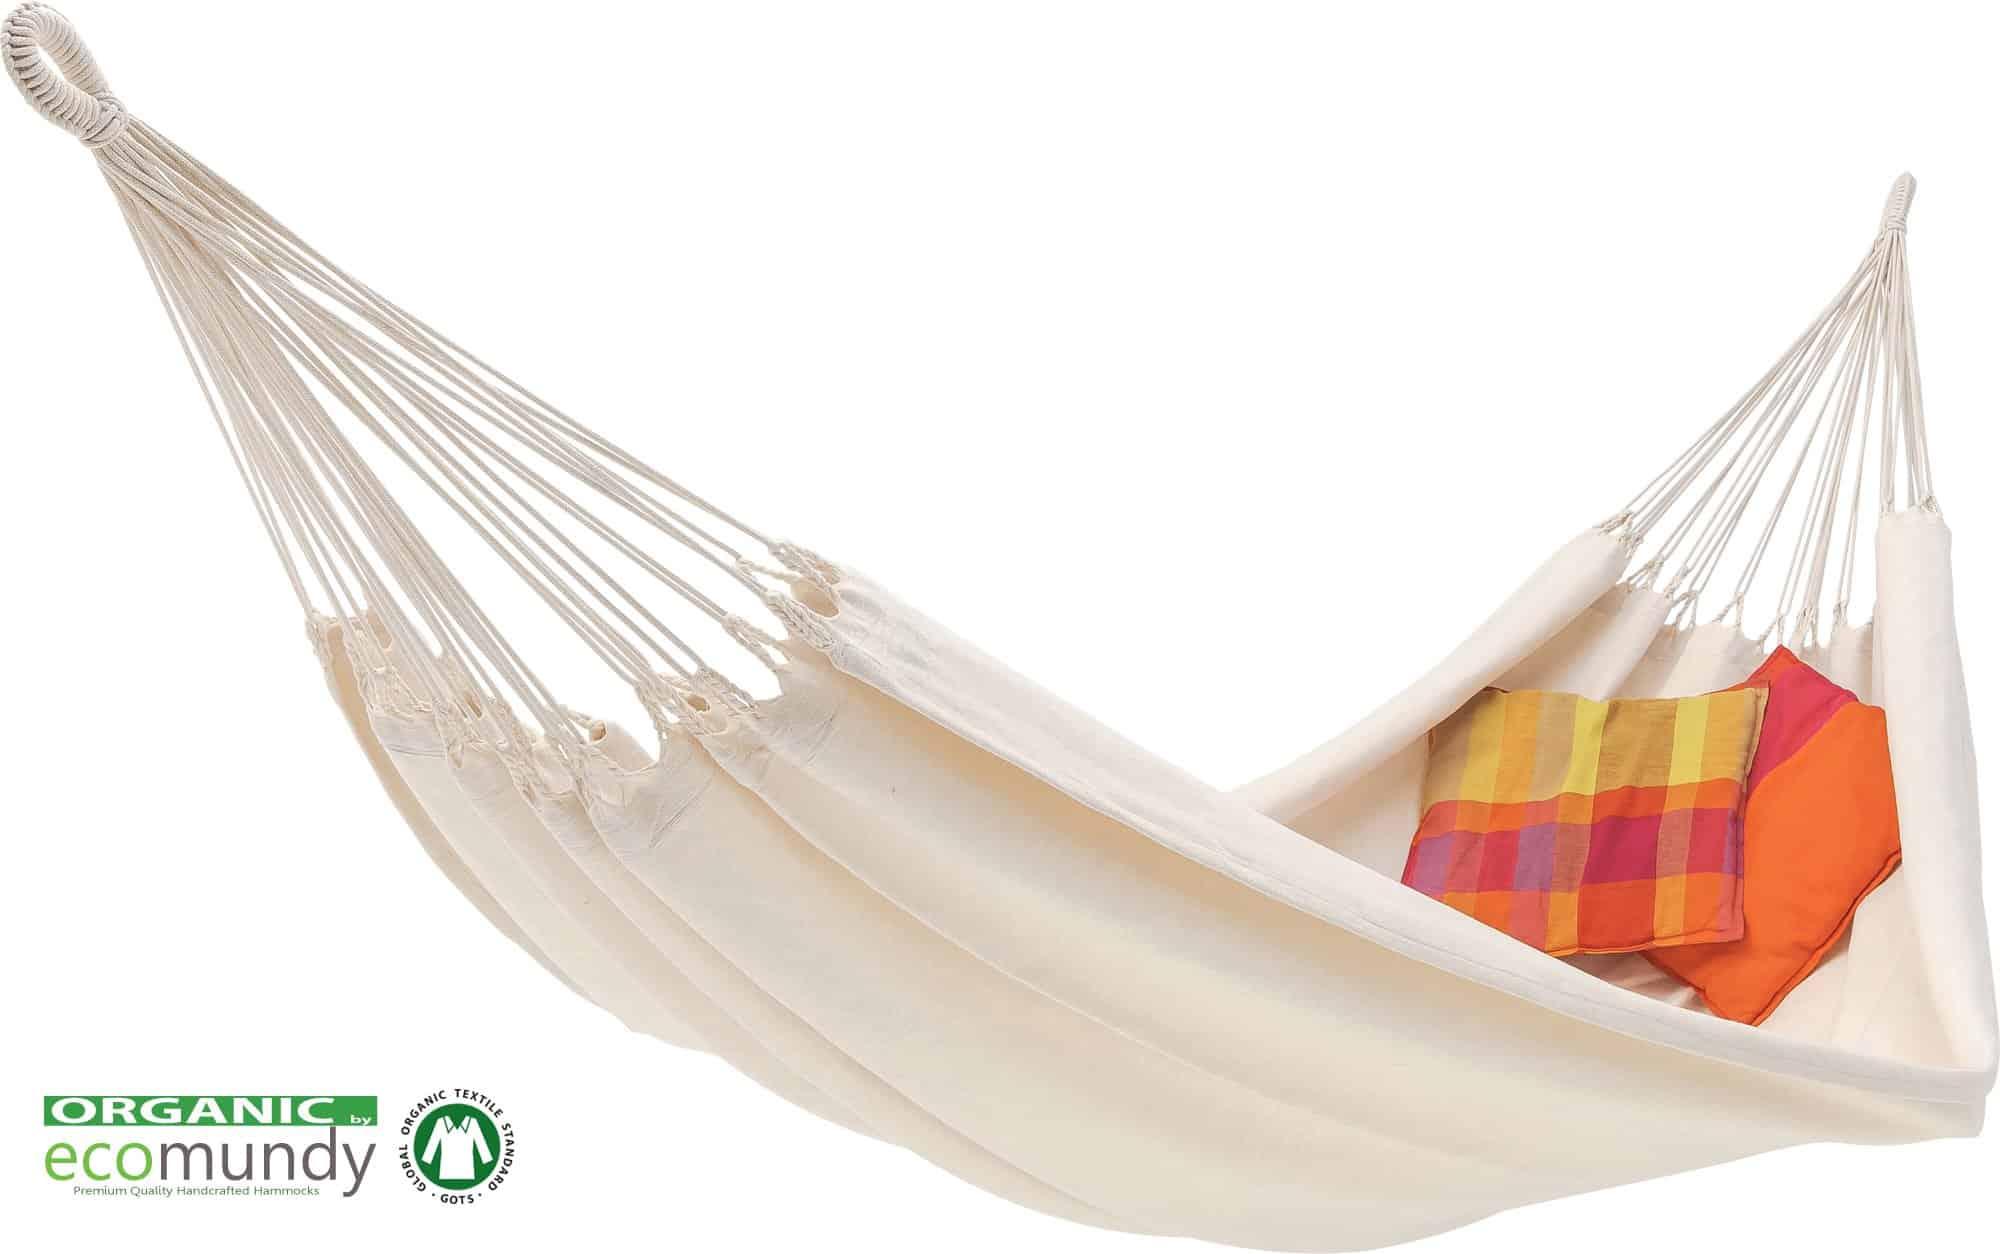 Luxe 2persoons hangmat naturel biologisch katoen GOTS Ecomundy Pure XL wit